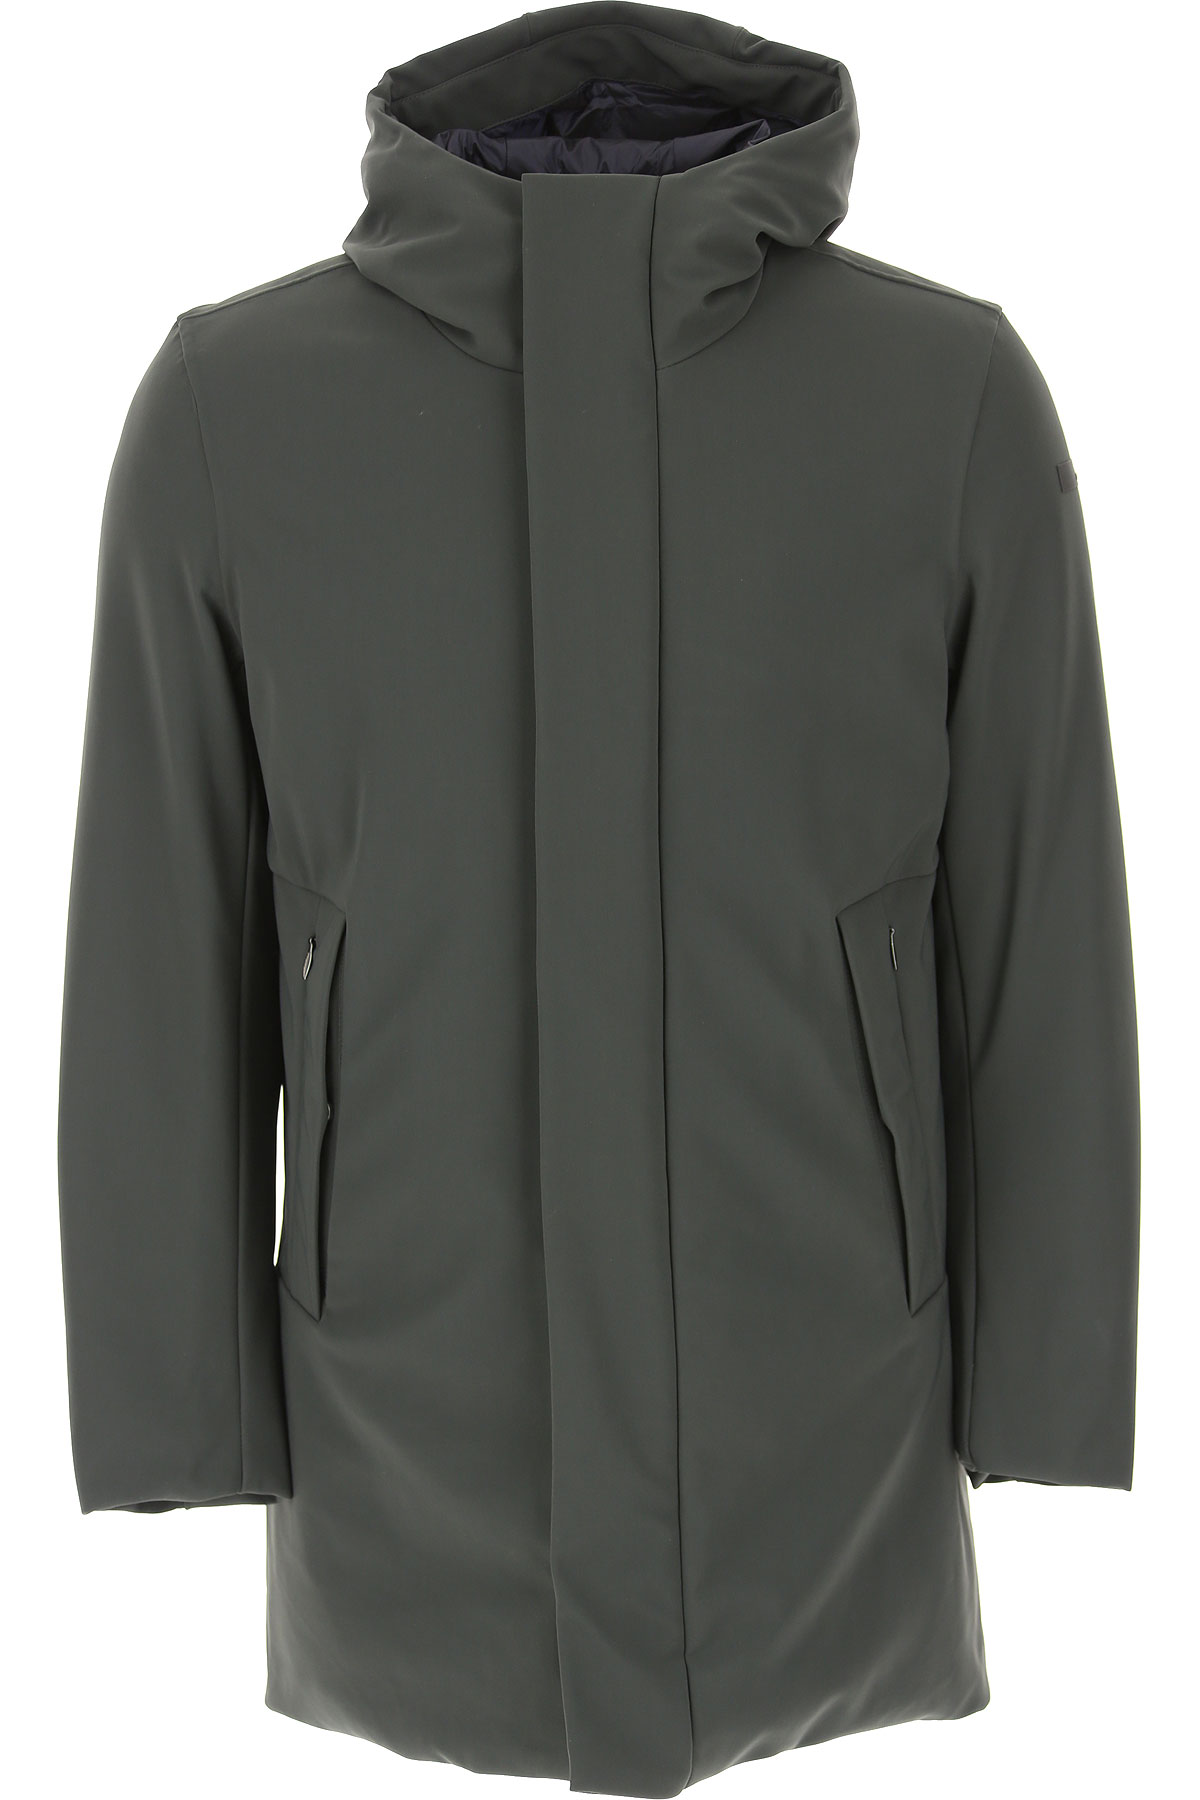 RRD Jacket for Men On Sale, Dark Grey, polyamide, 2019, L XXL